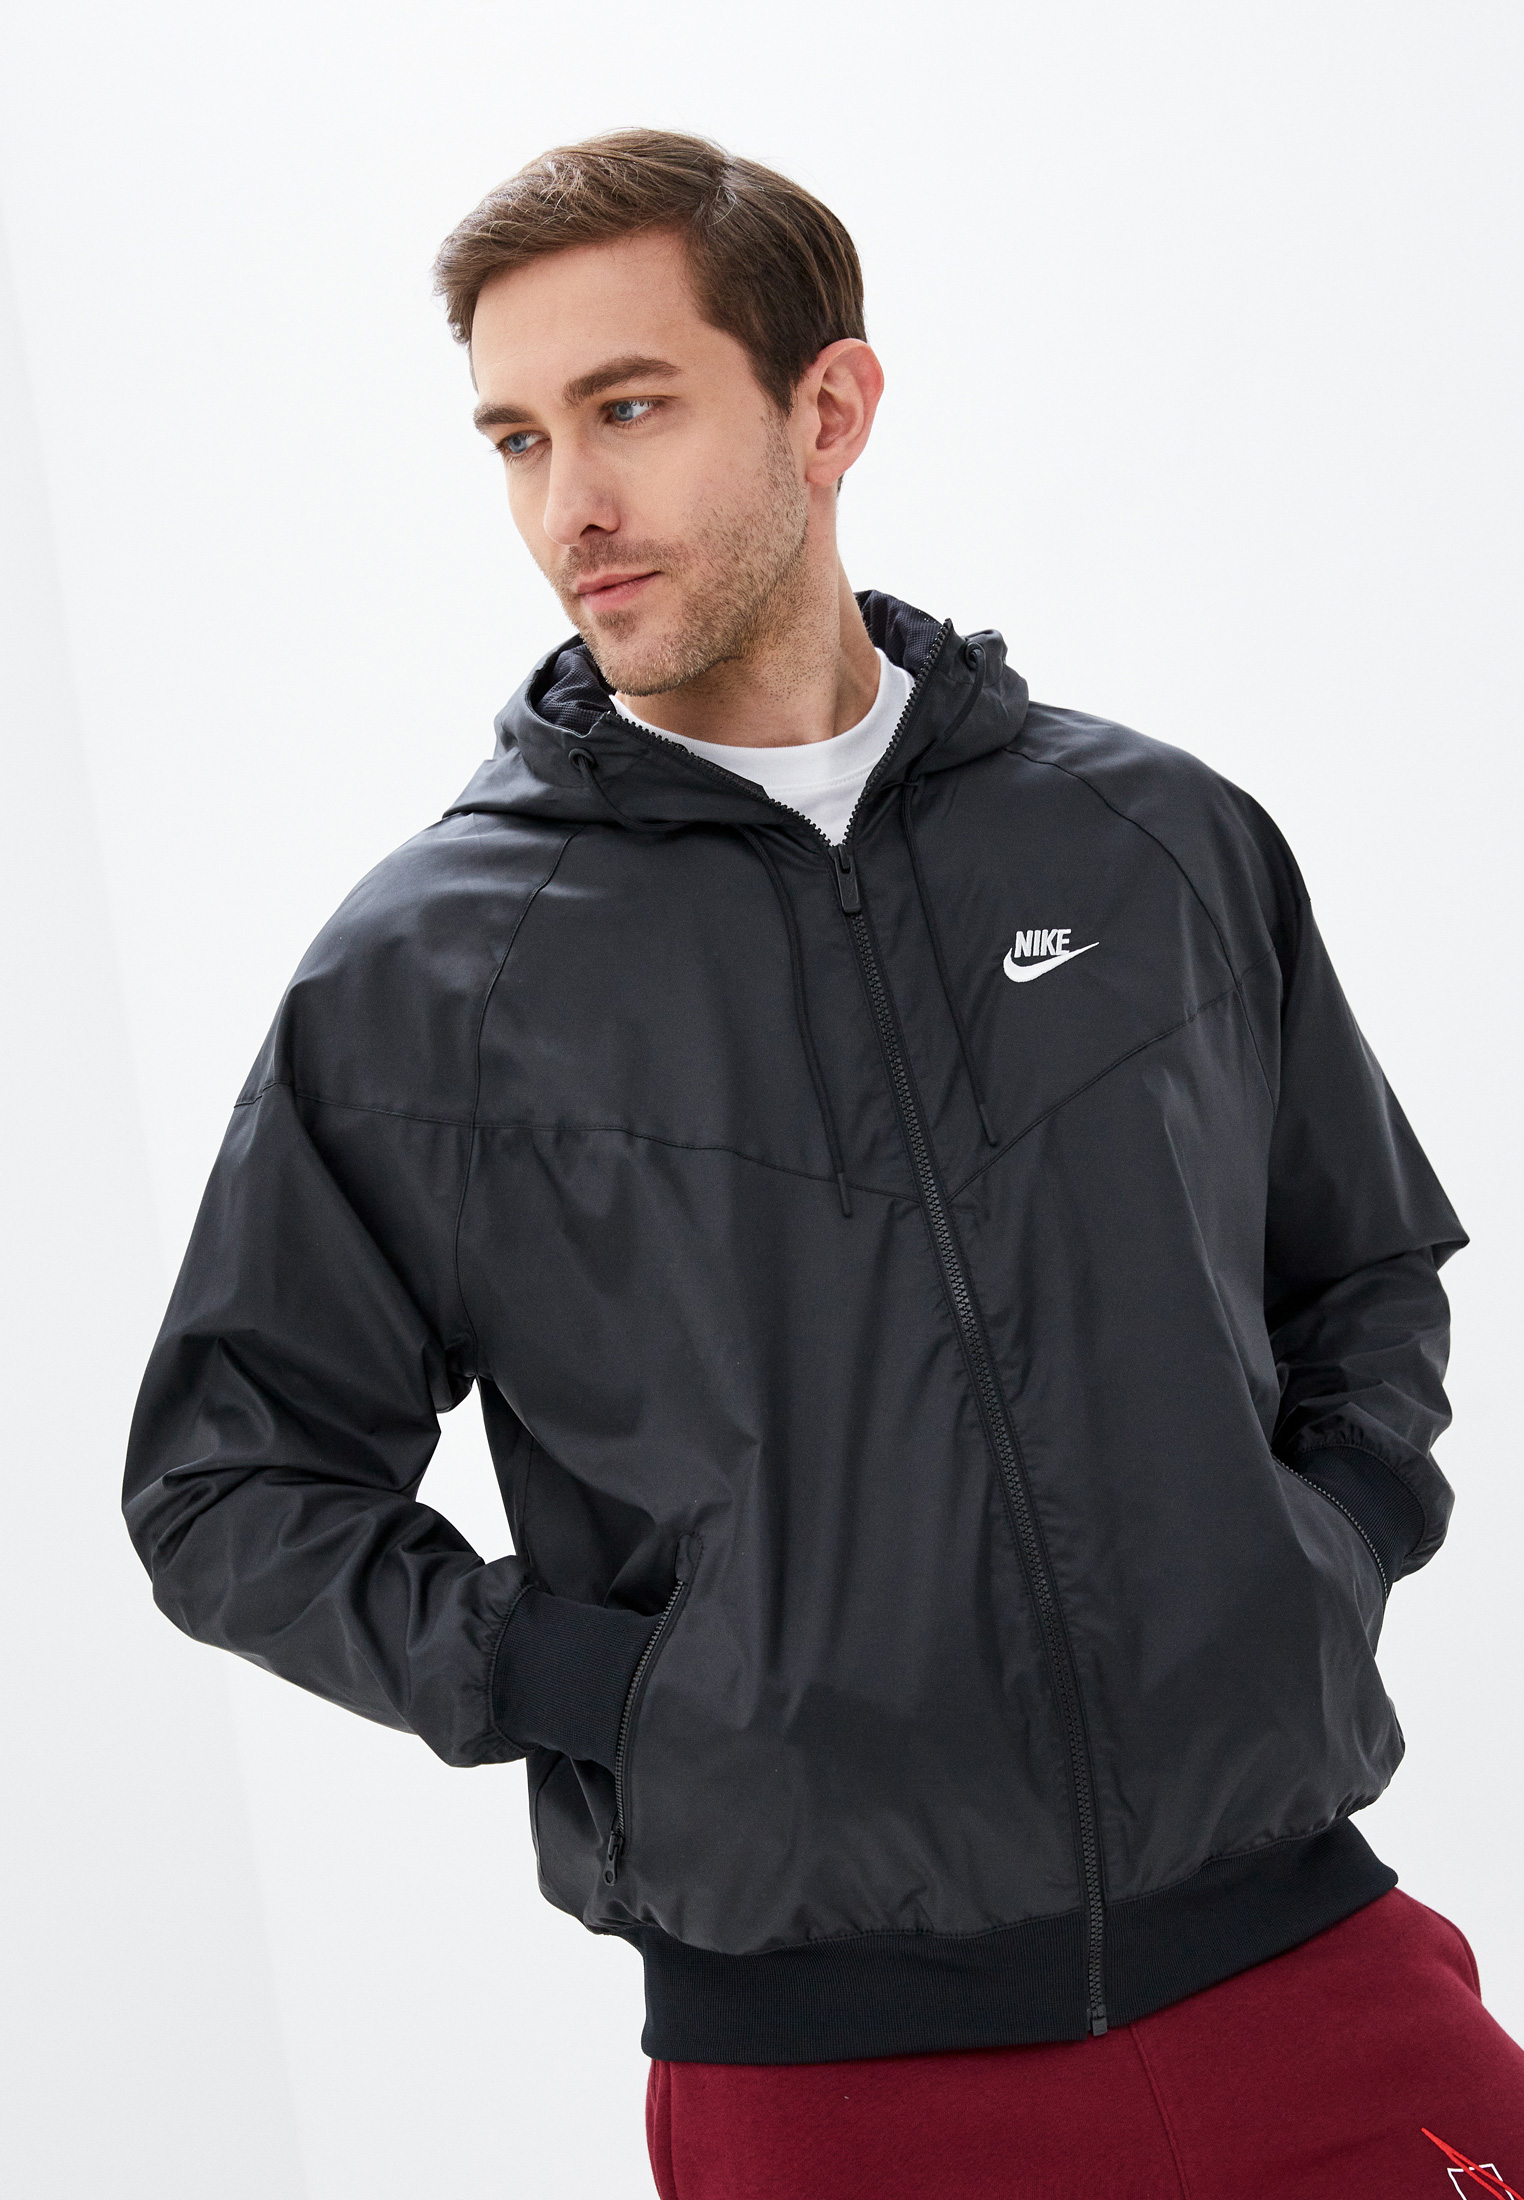 Мужская верхняя одежда Nike (Найк) Ветровка Nike